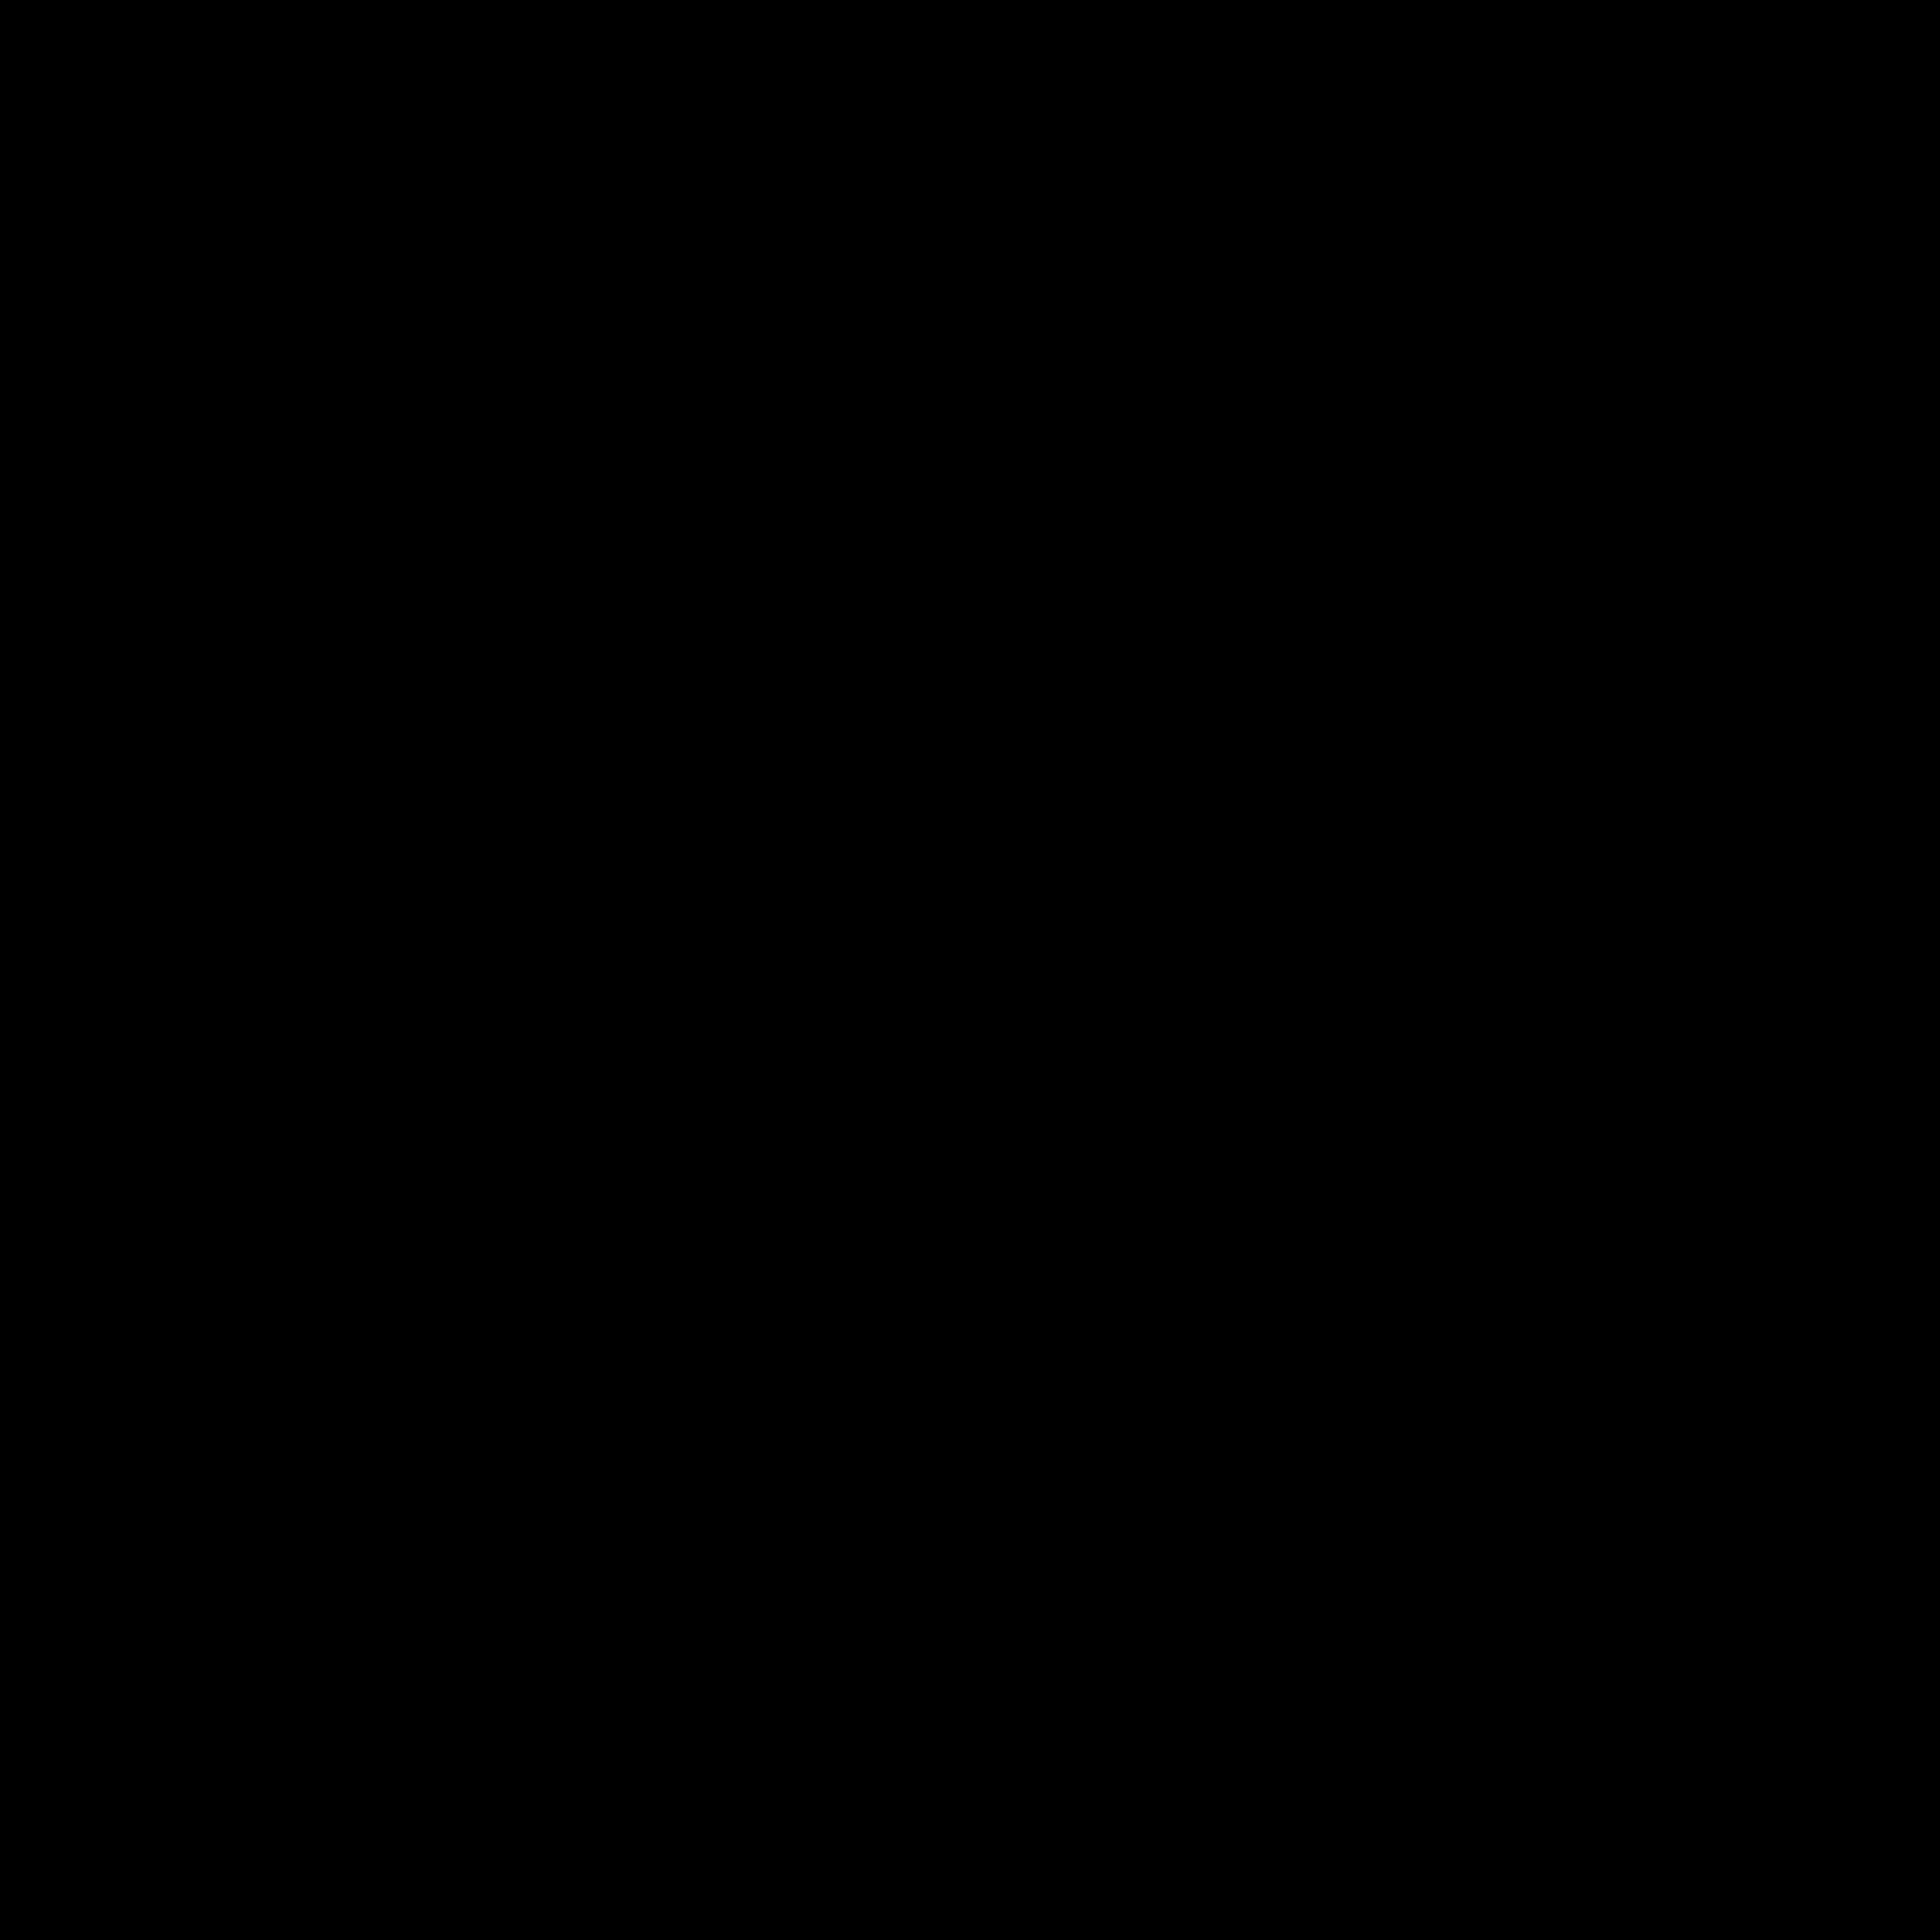 dc  dc converter inrush current